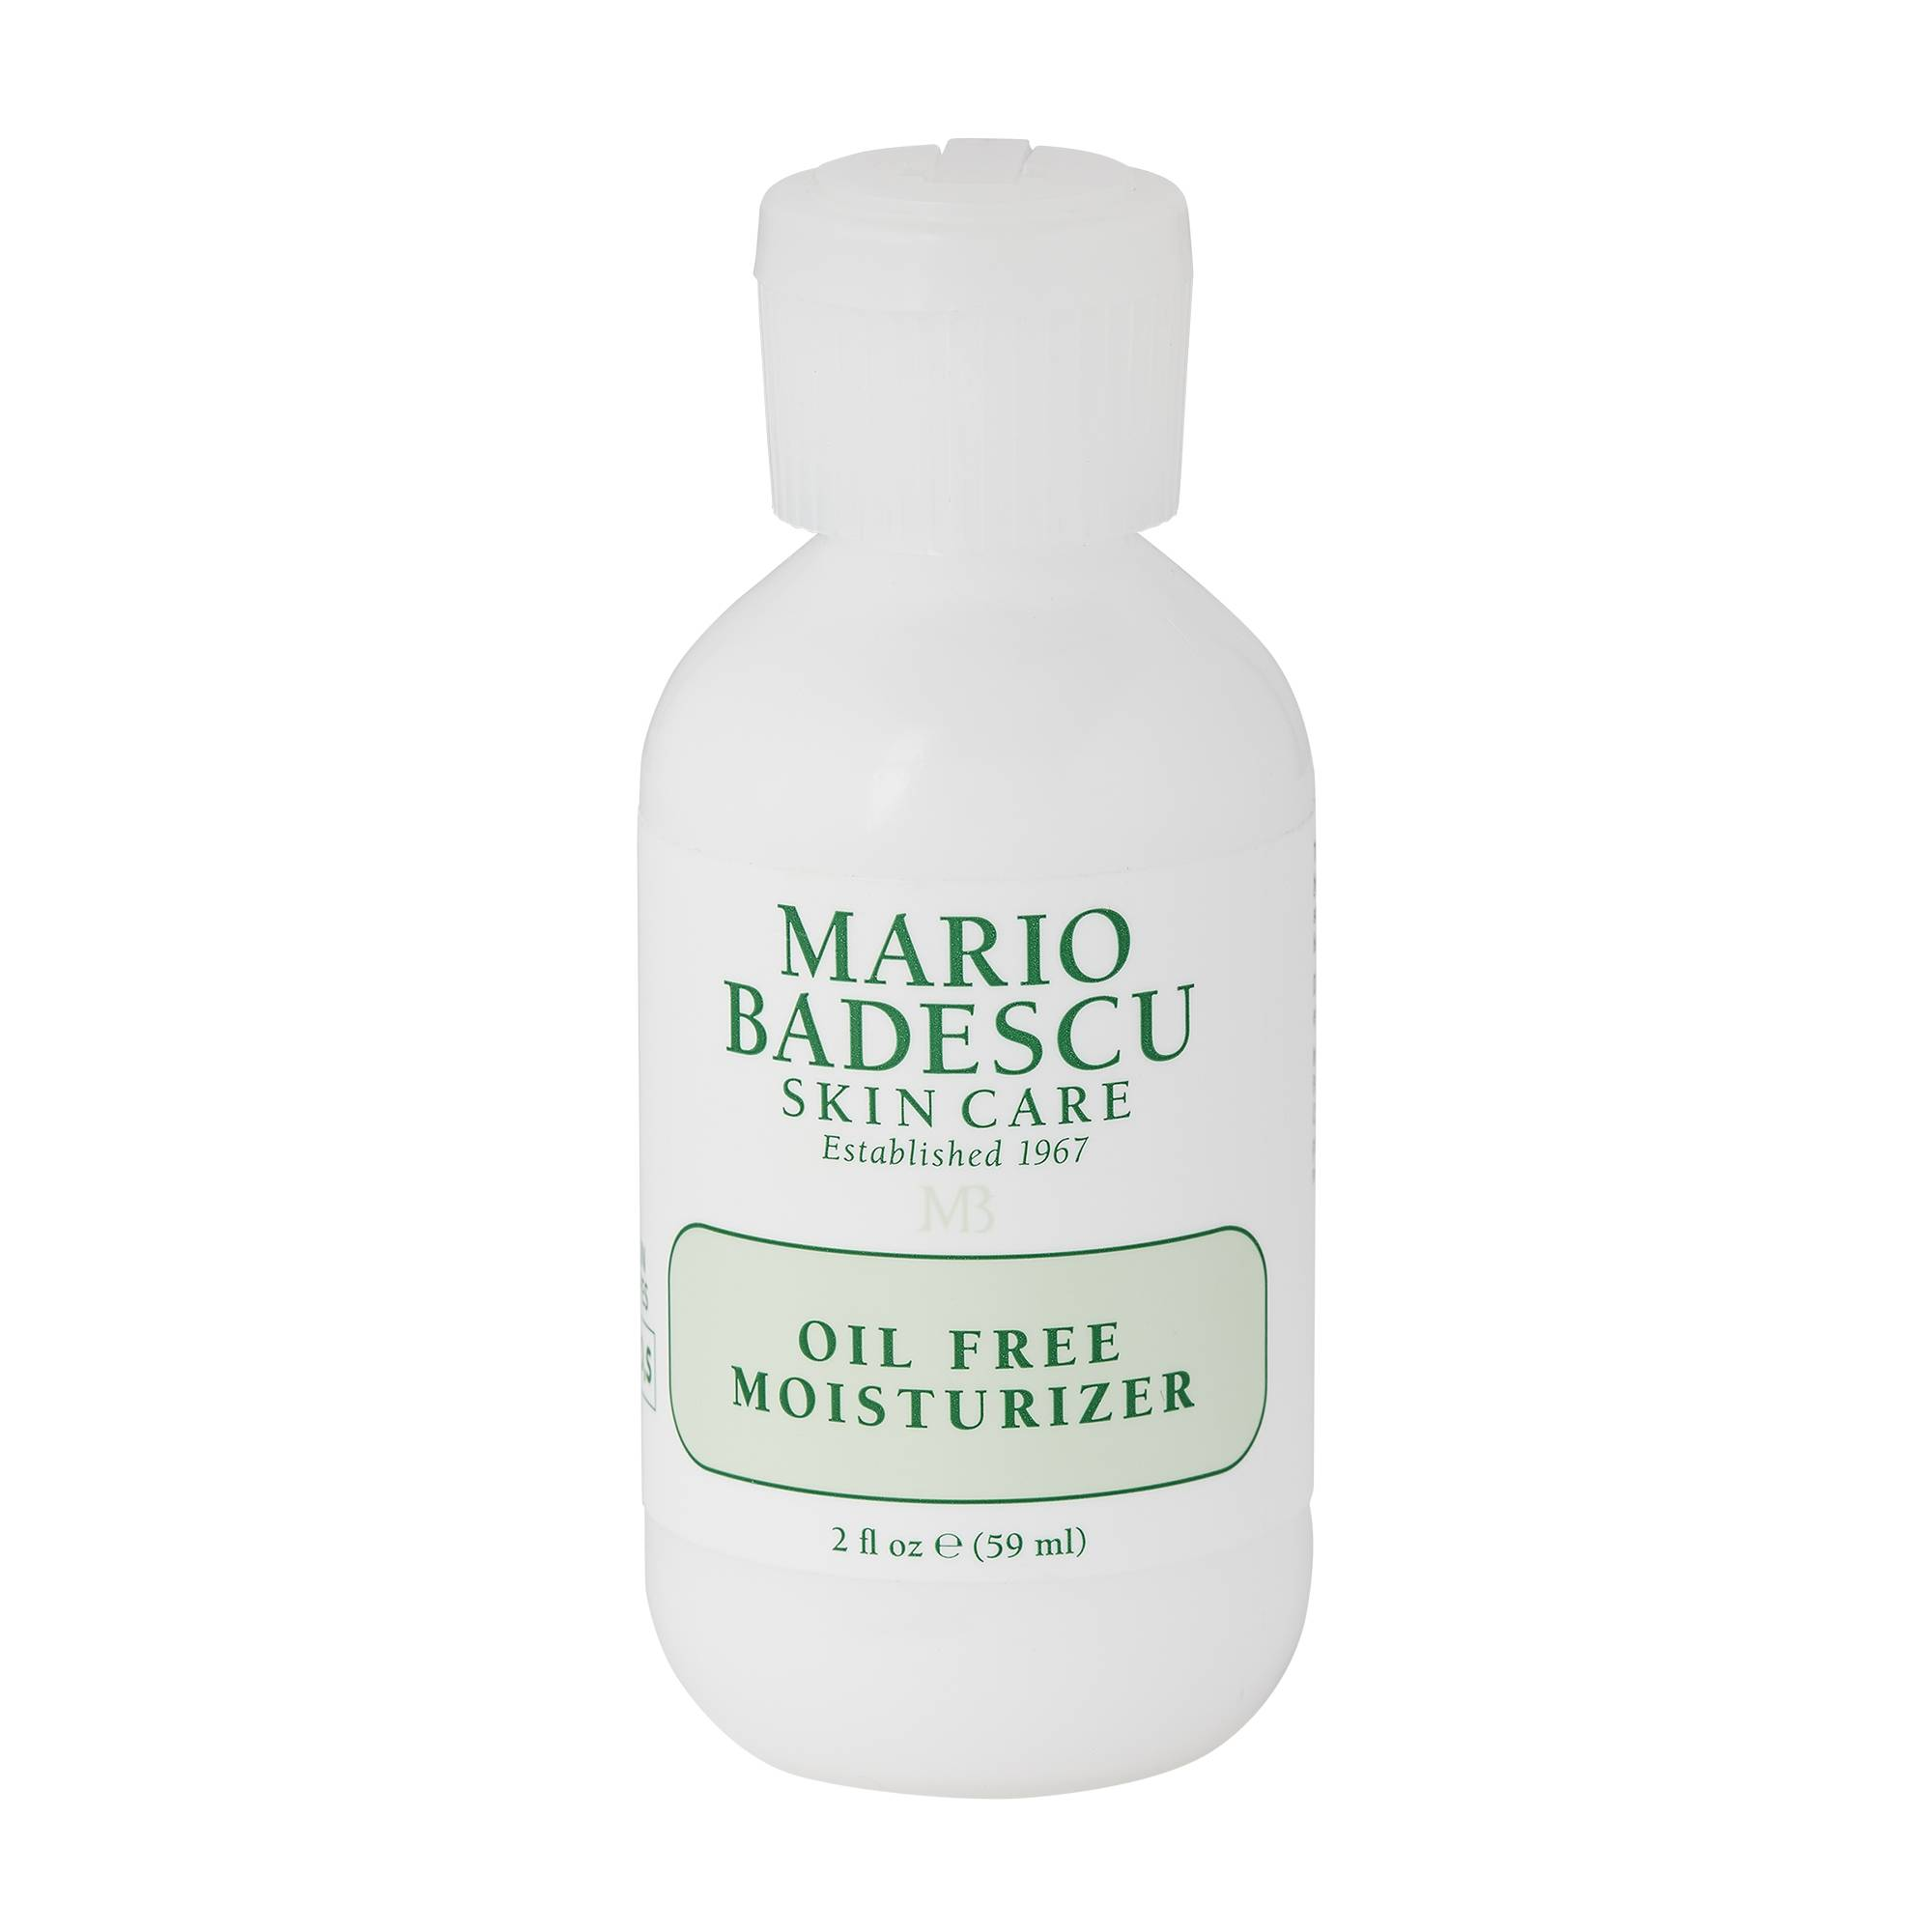 Mario Badescu Soin hydratant sans huile 59ml